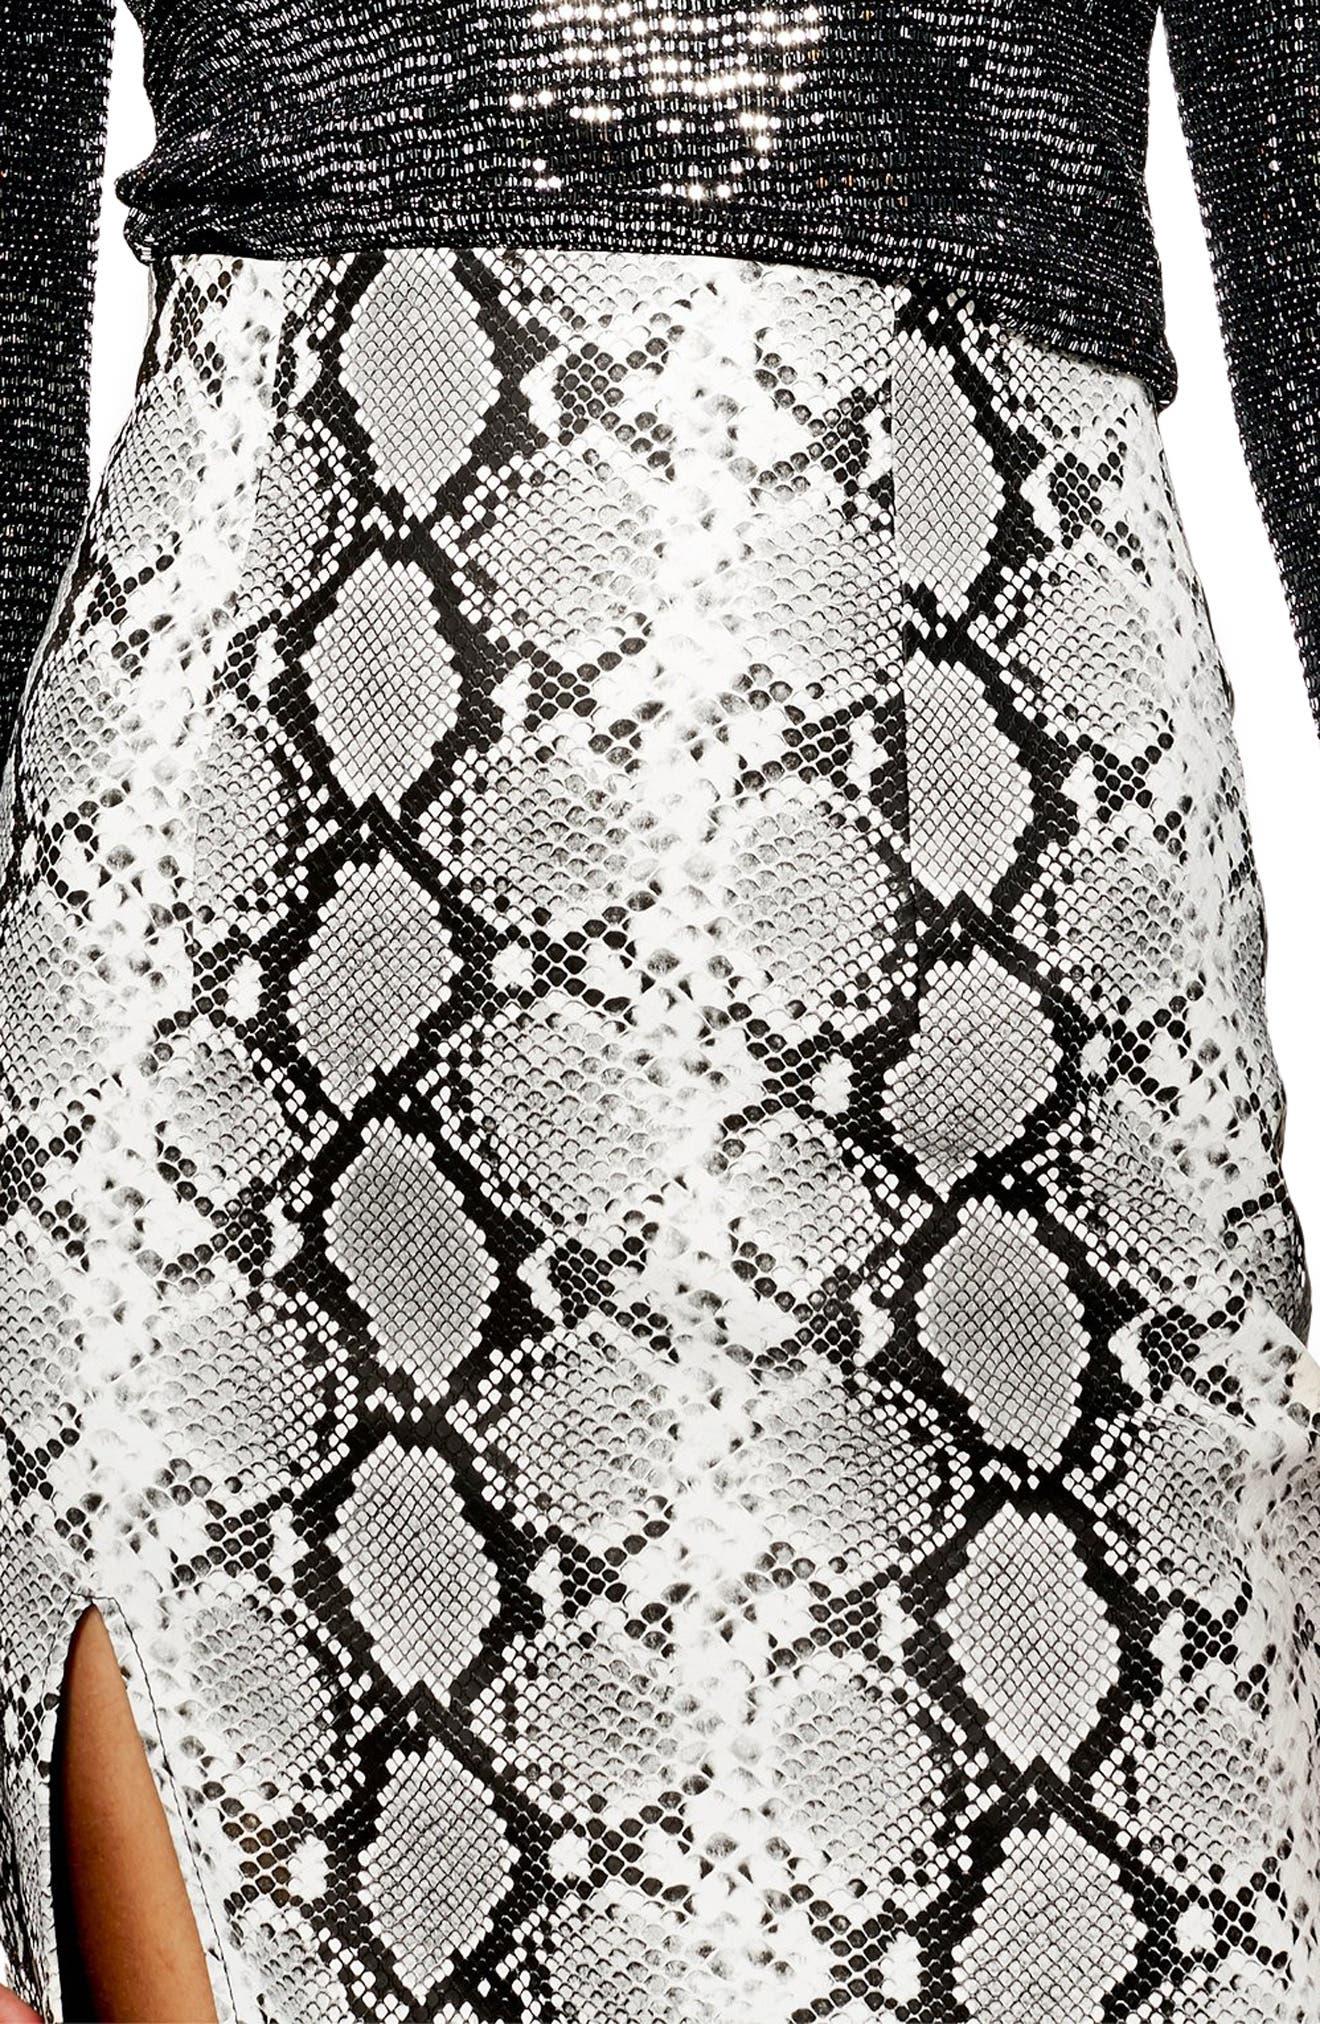 TOPSHOP, Snake Print Faux Leather Midi Skirt, Alternate thumbnail 3, color, 002